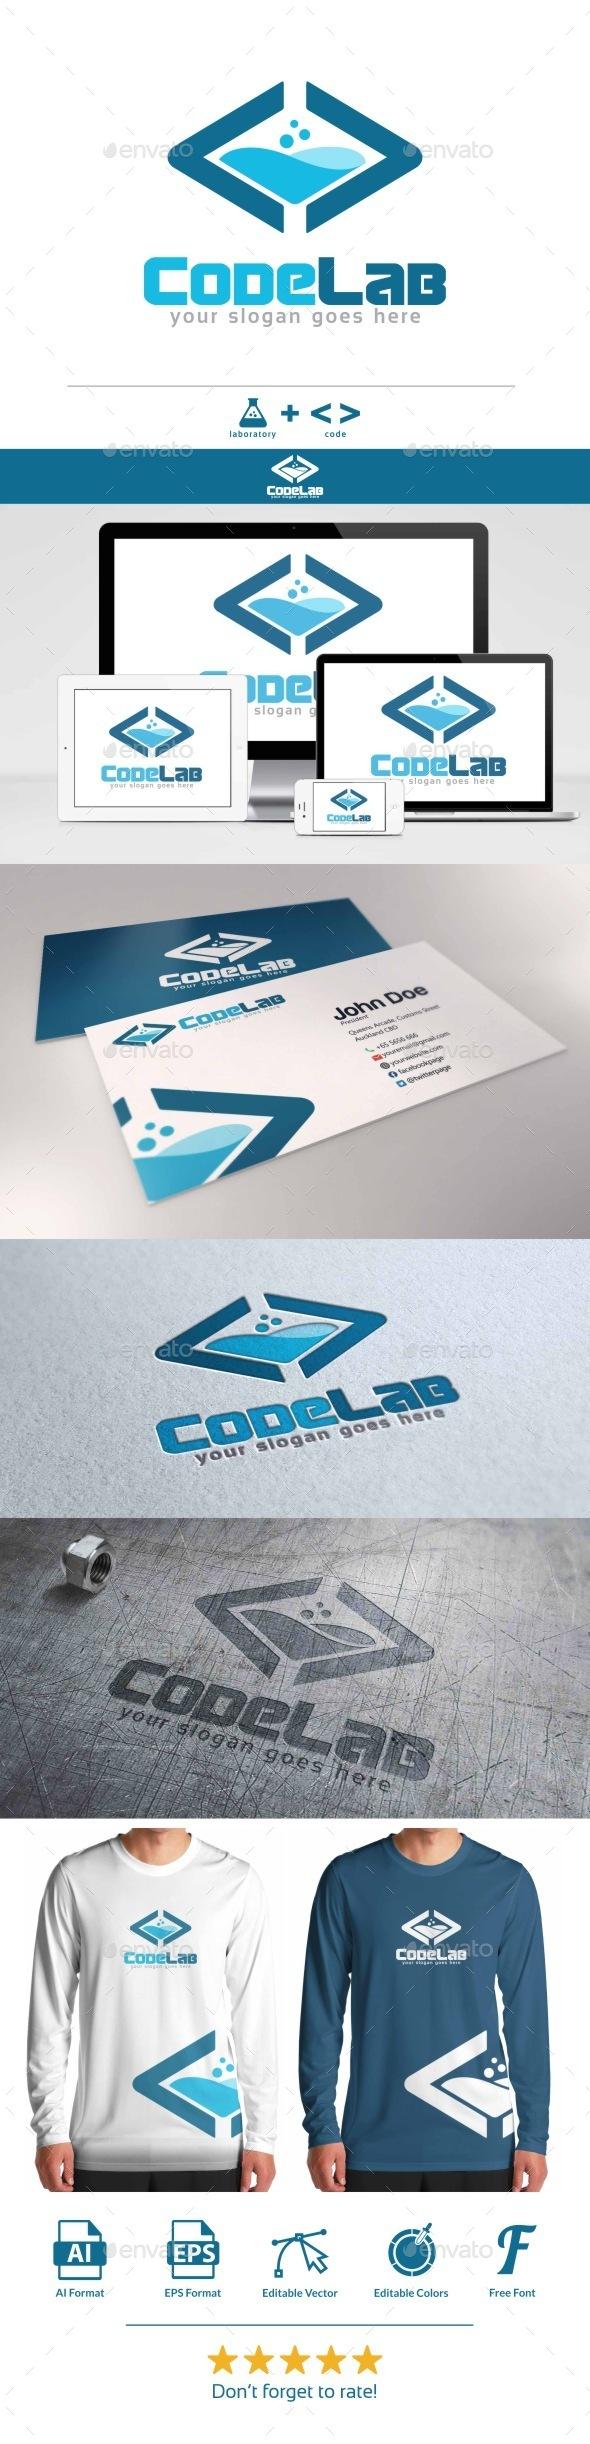 GraphicRiver Code Lab Logo 9455281